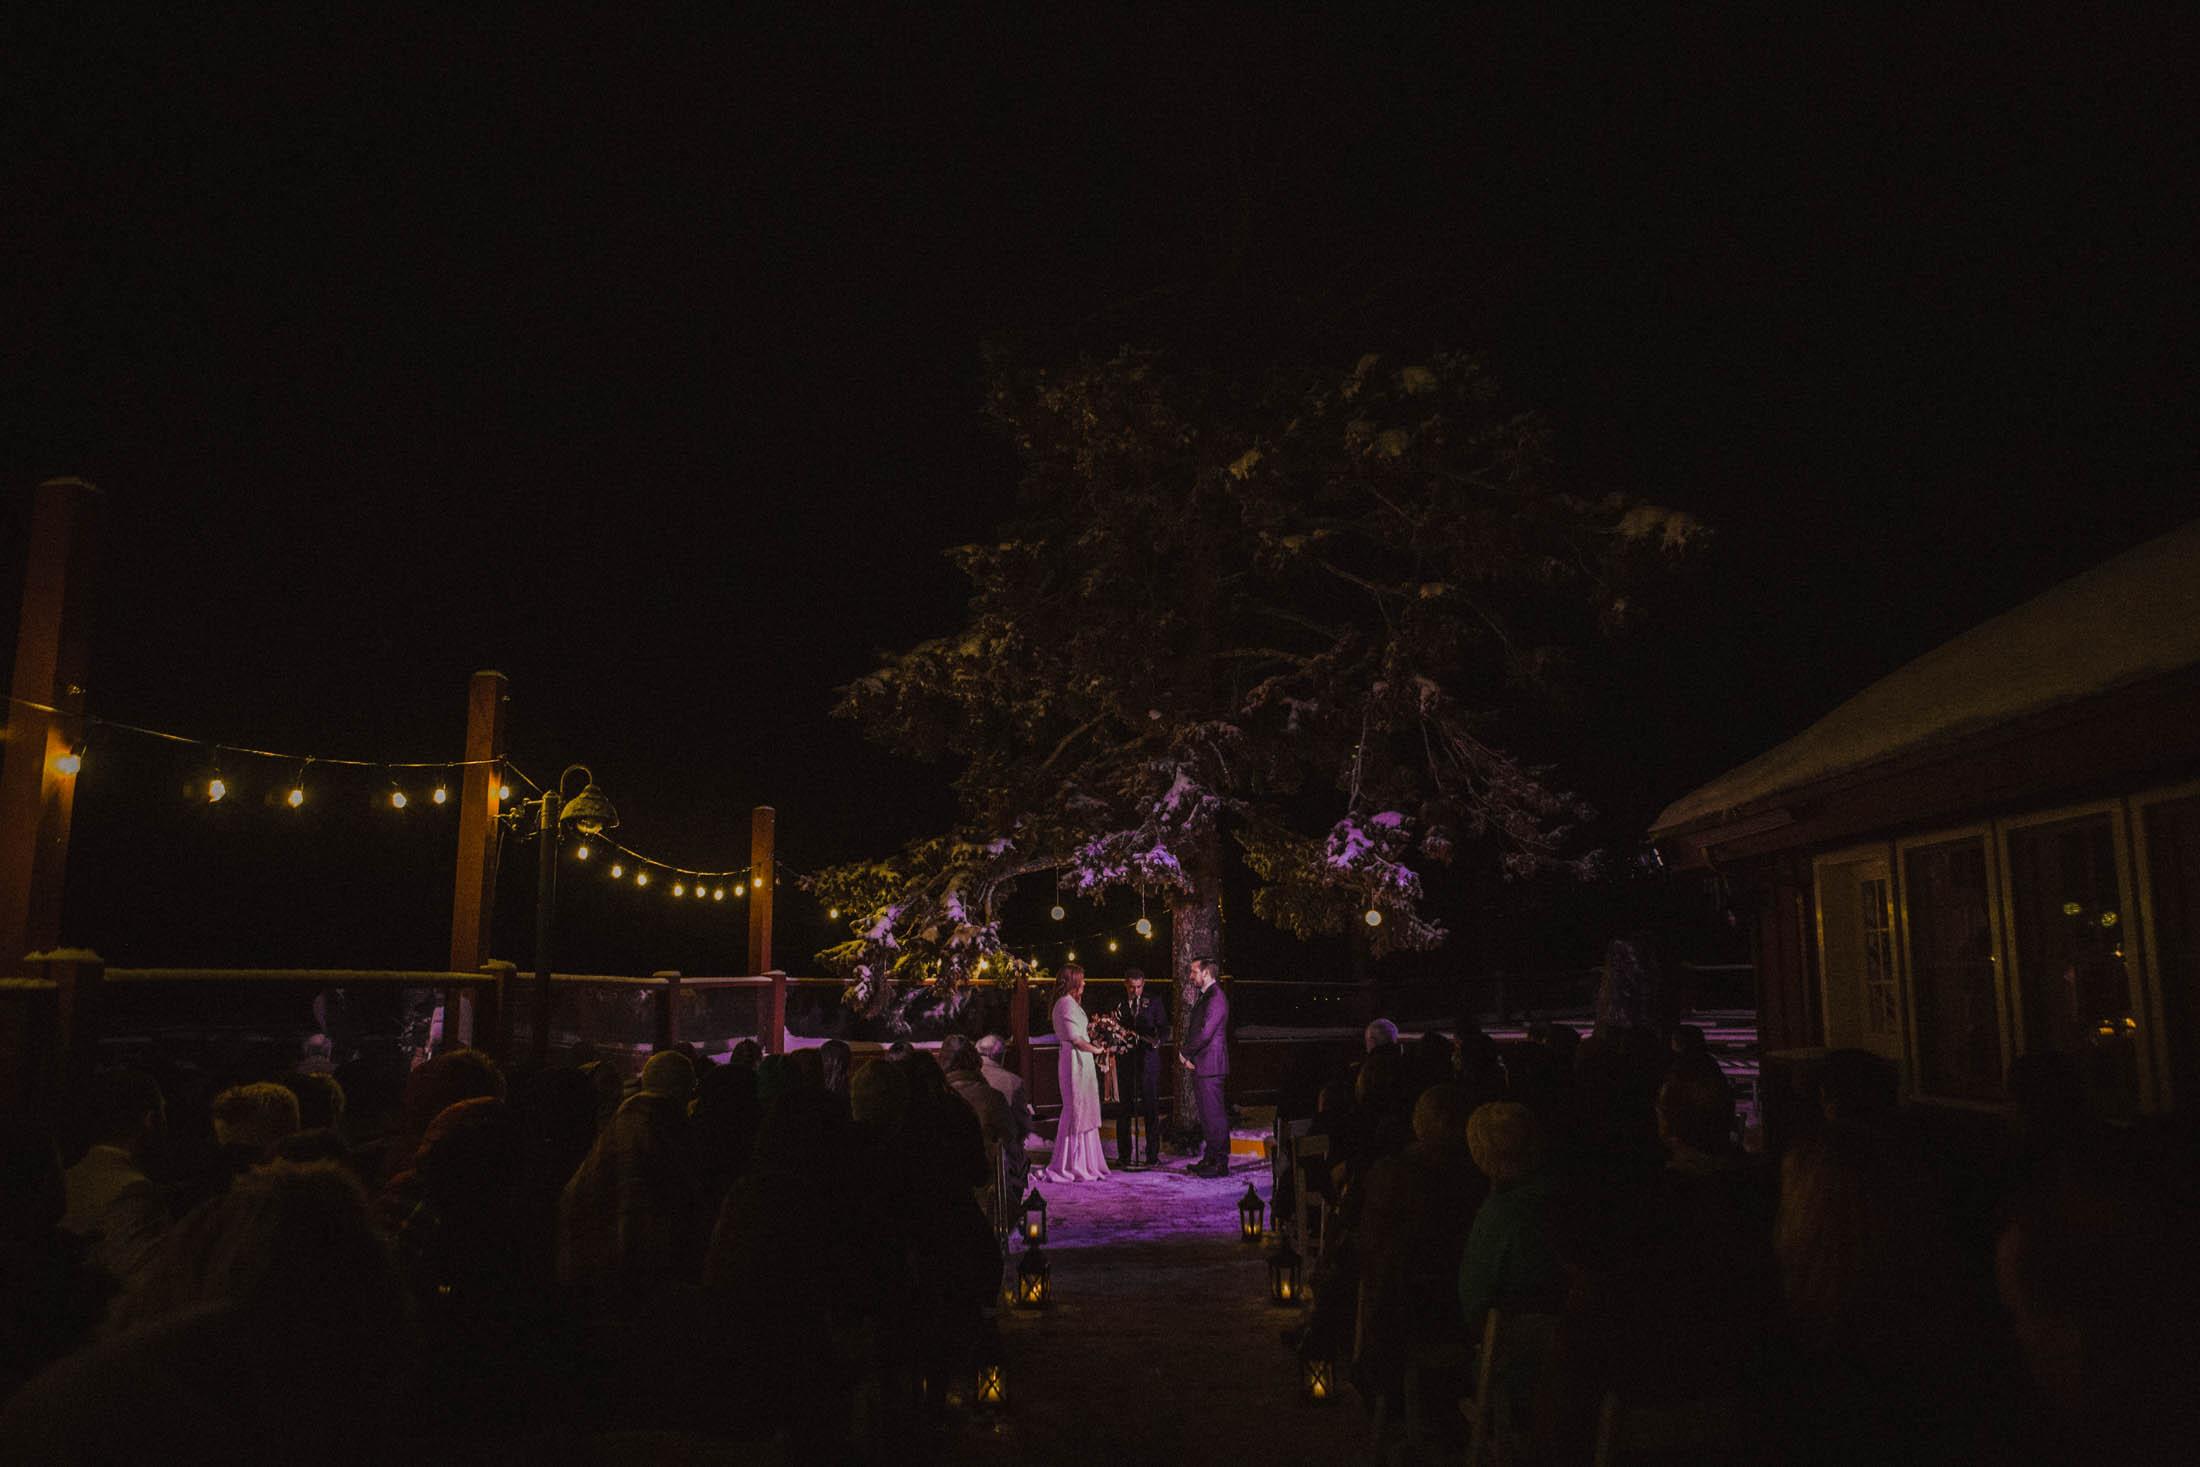 roundhouse_sunValley_wedding-32.jpg